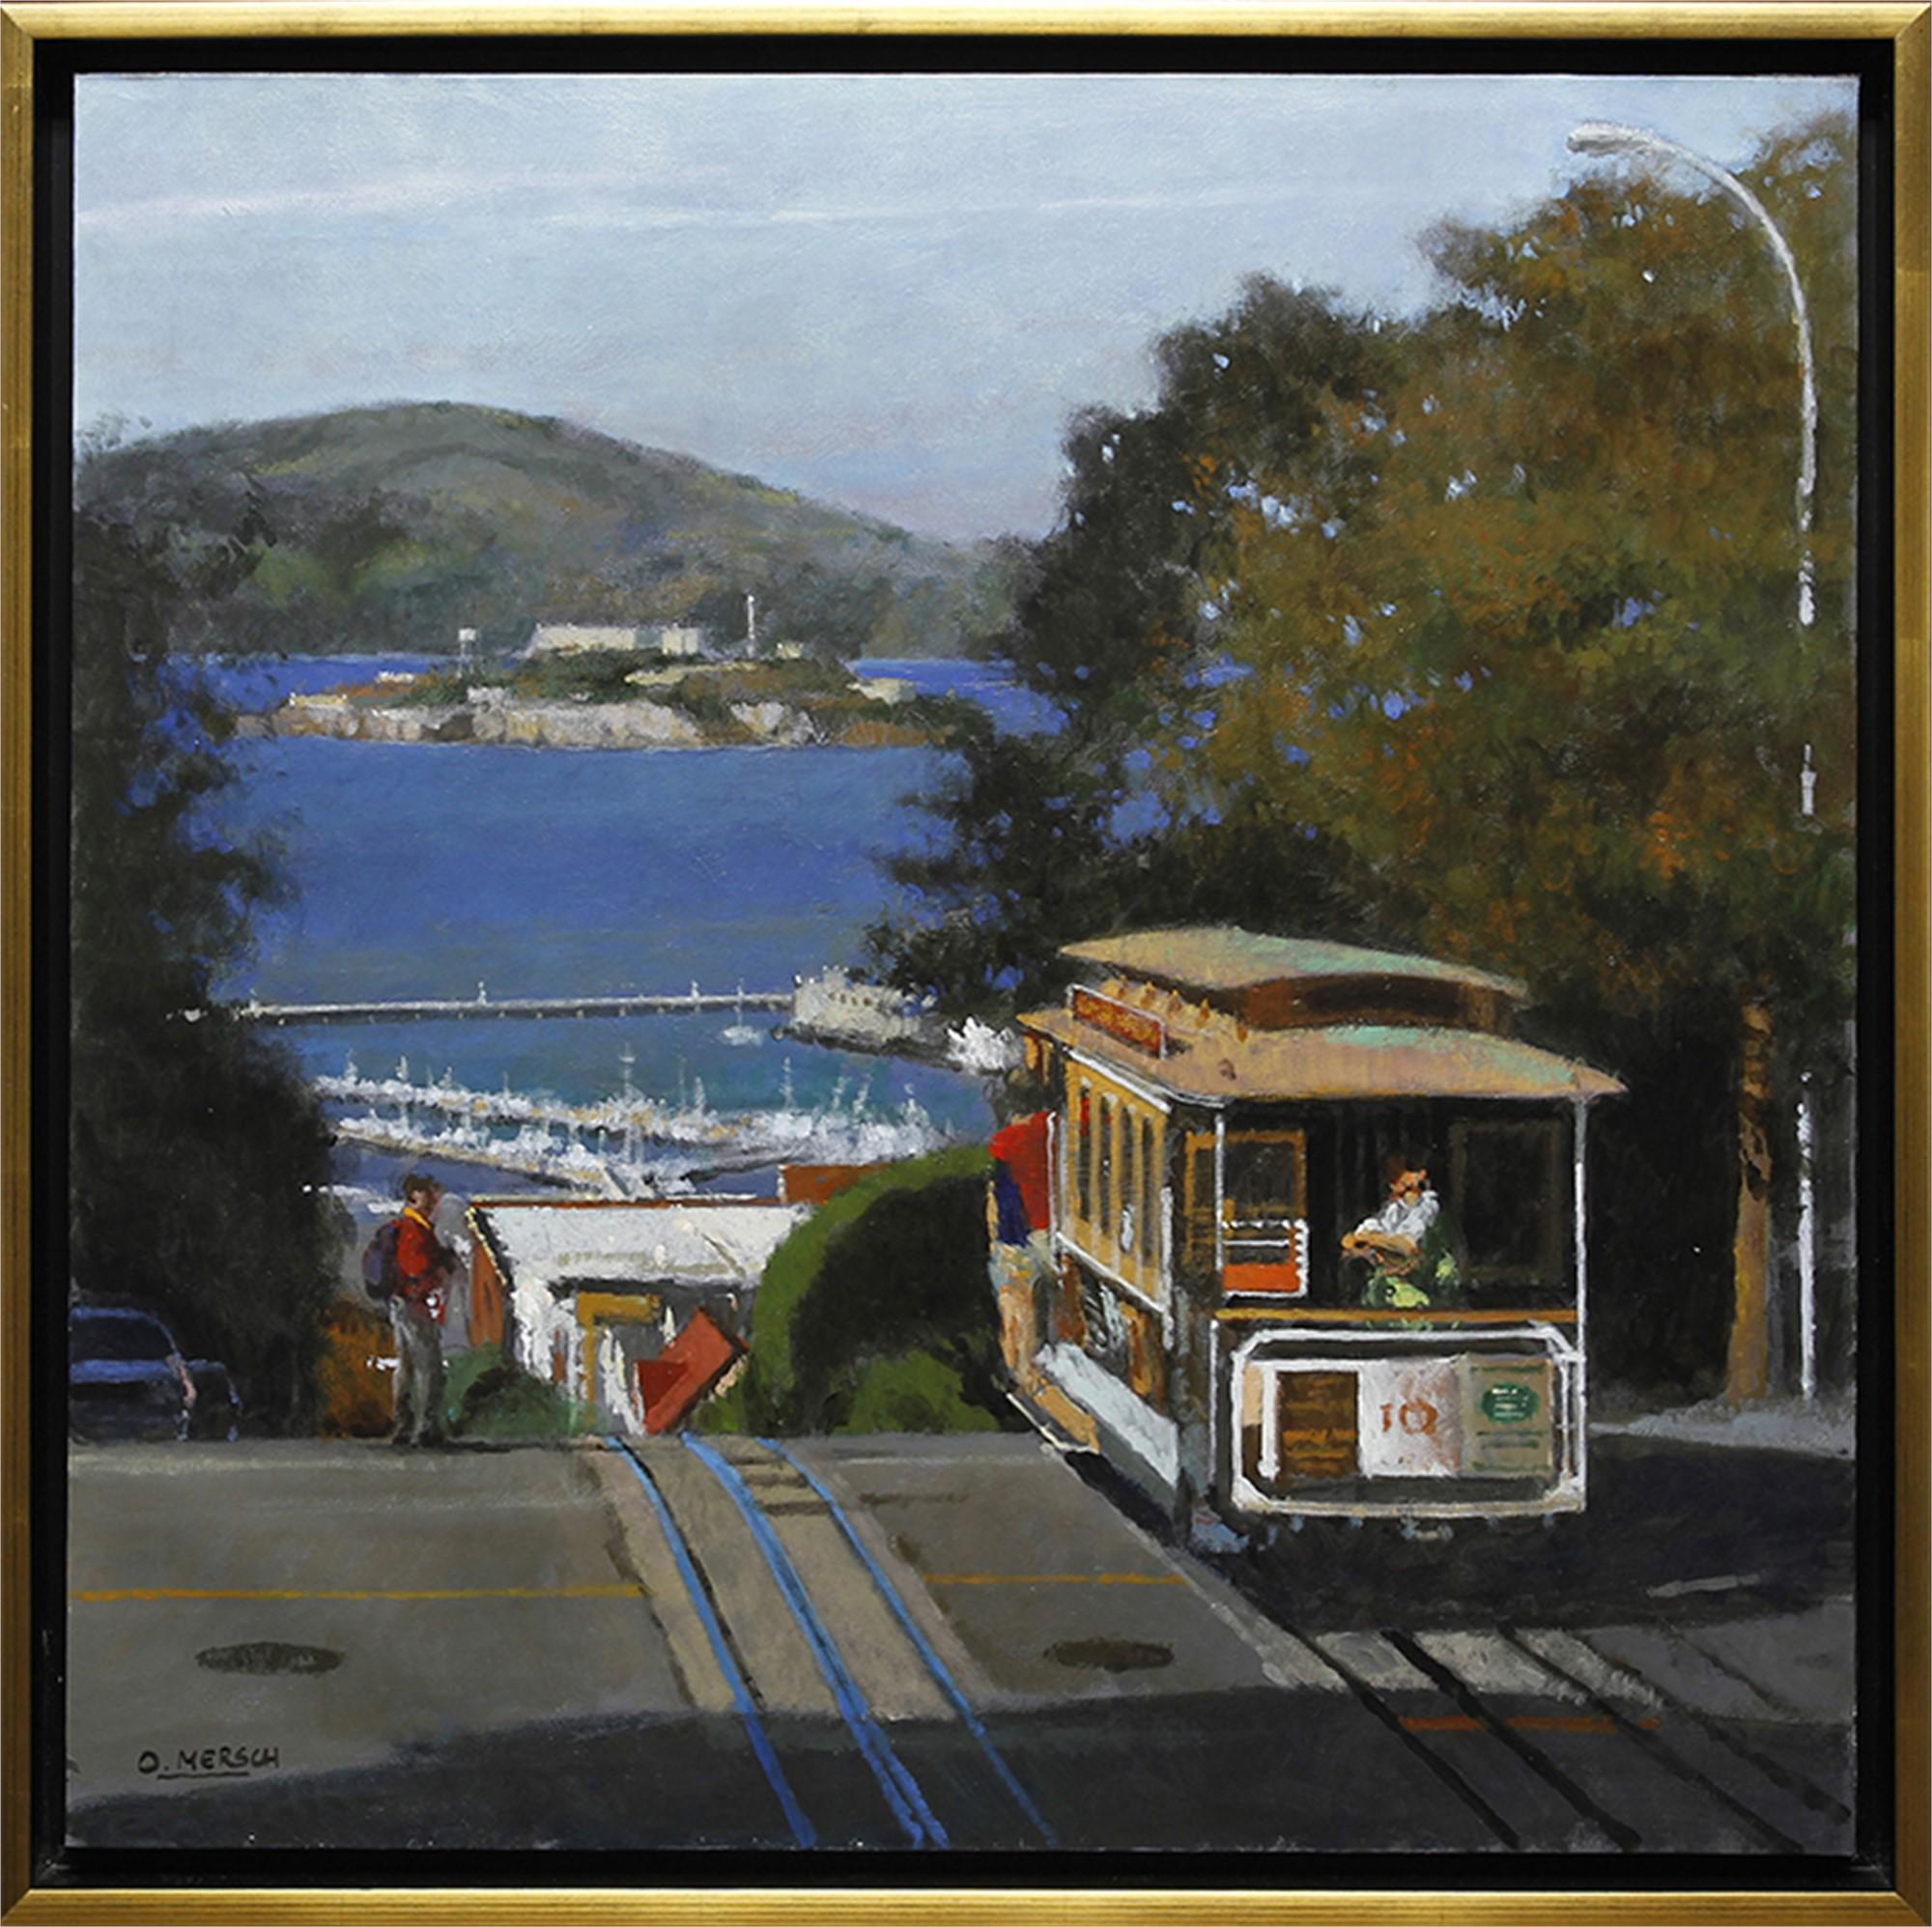 San Francisco Tramway by Oscar Mersch